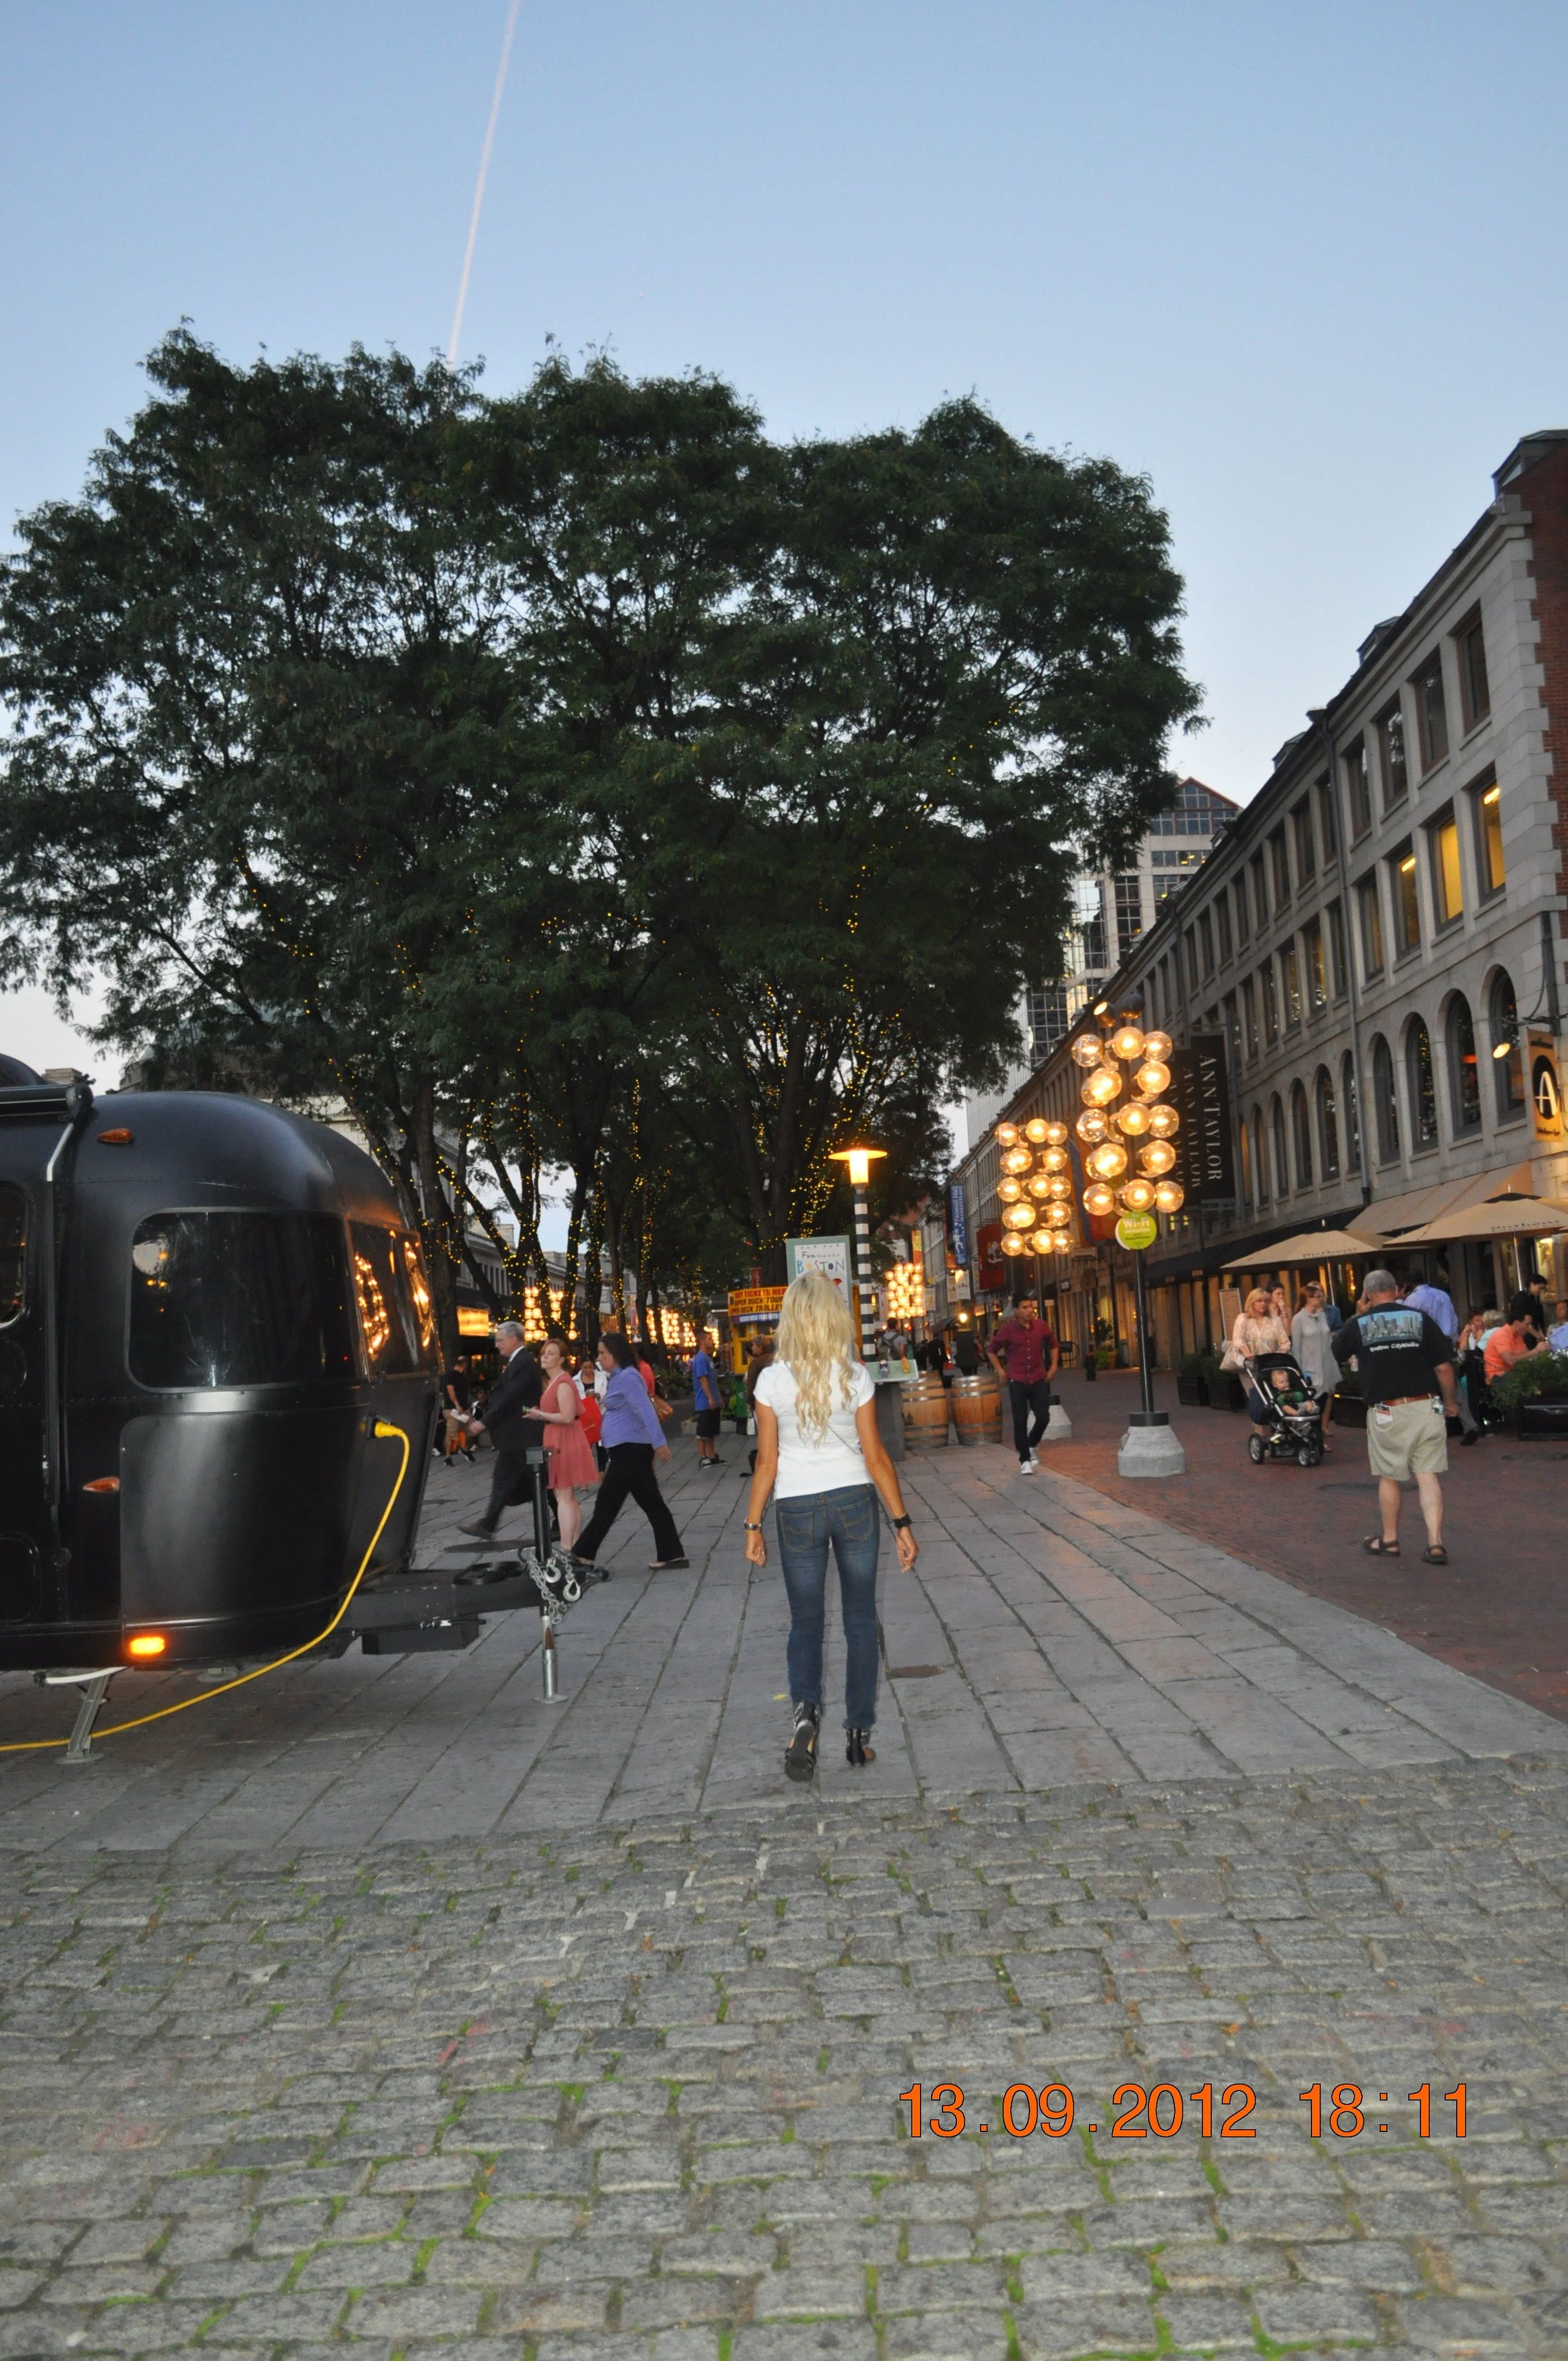 Christmas Fair Charlestown Nh 2020 Near Market Square Boston Ma   26 in 2020   Walking tour, Factory